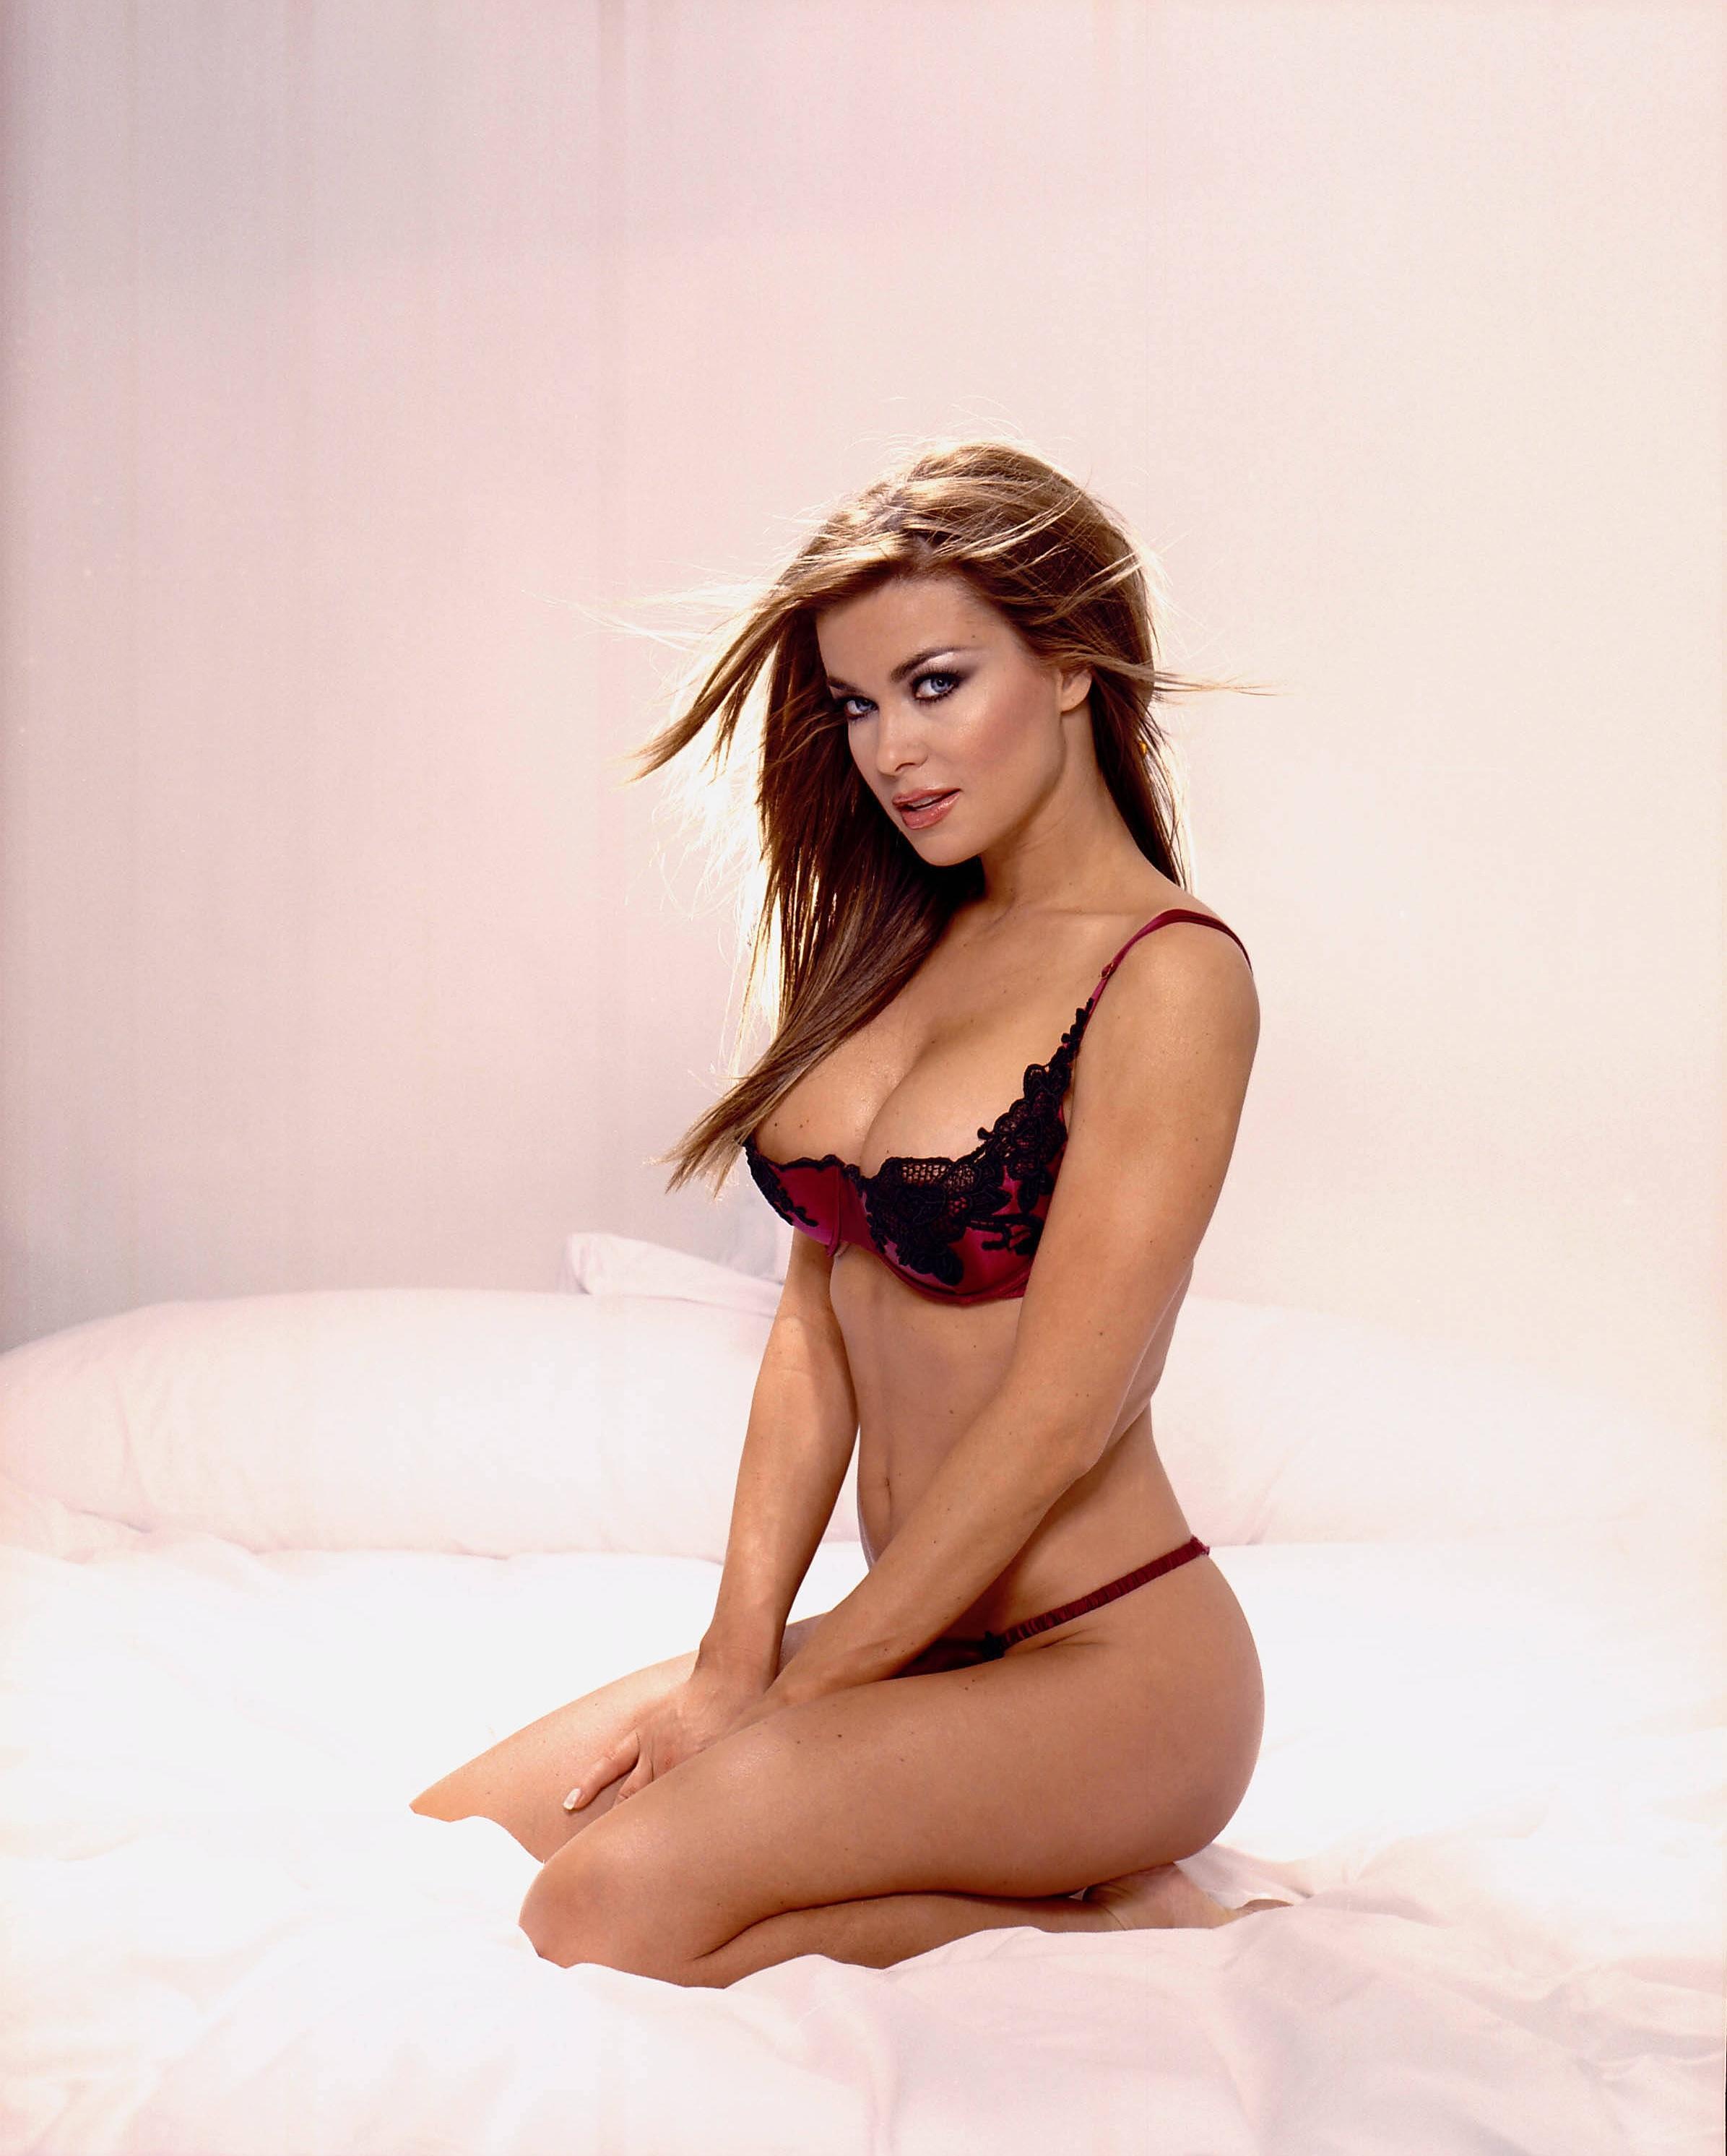 Nude courtney love pics